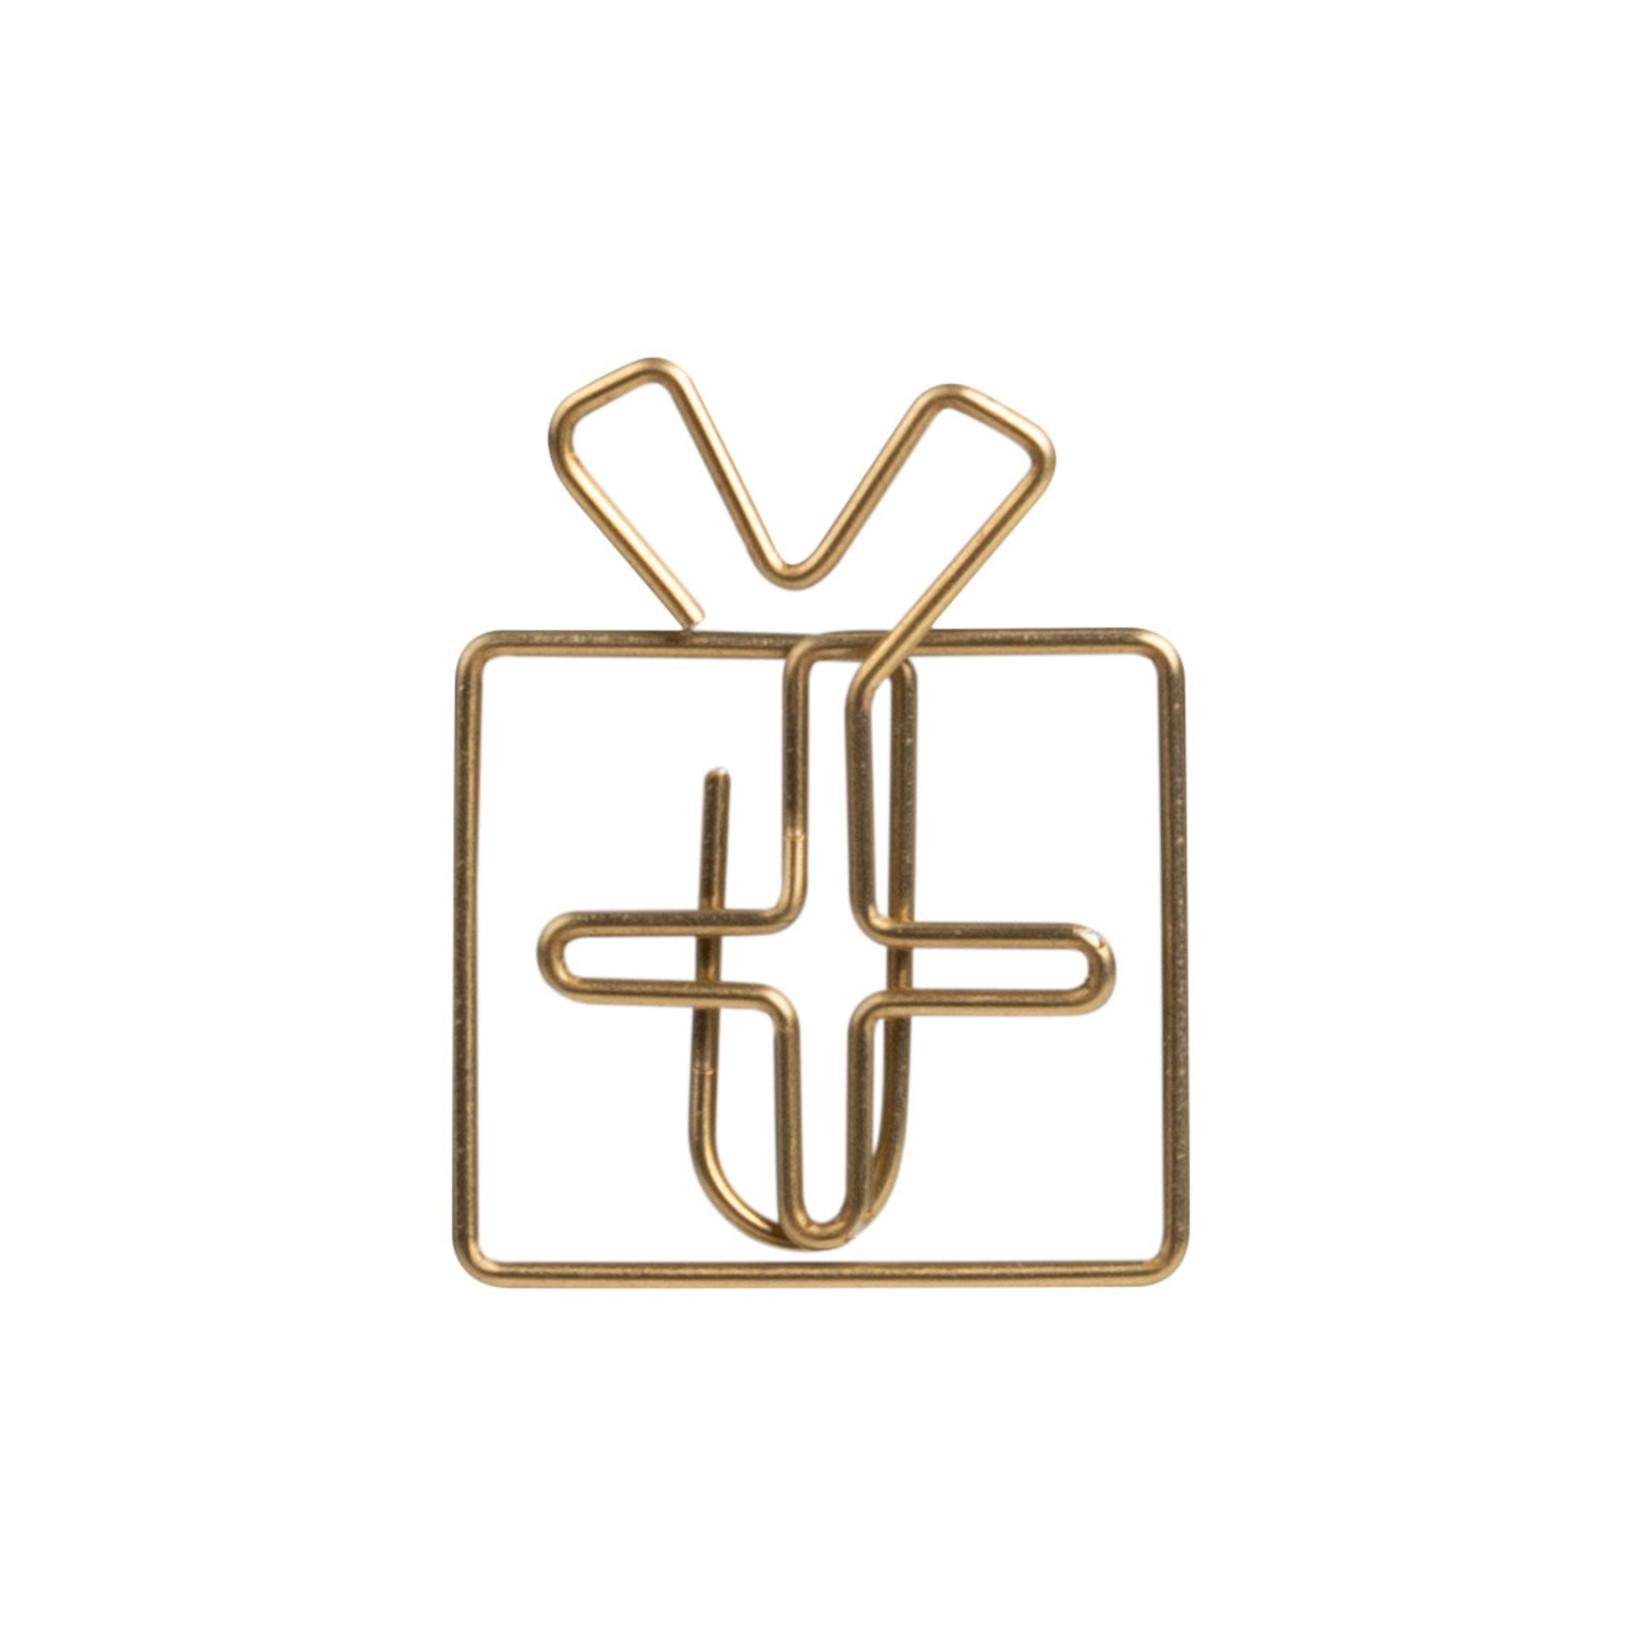 Räder Paperclip - Cadeautje - 15 stuks